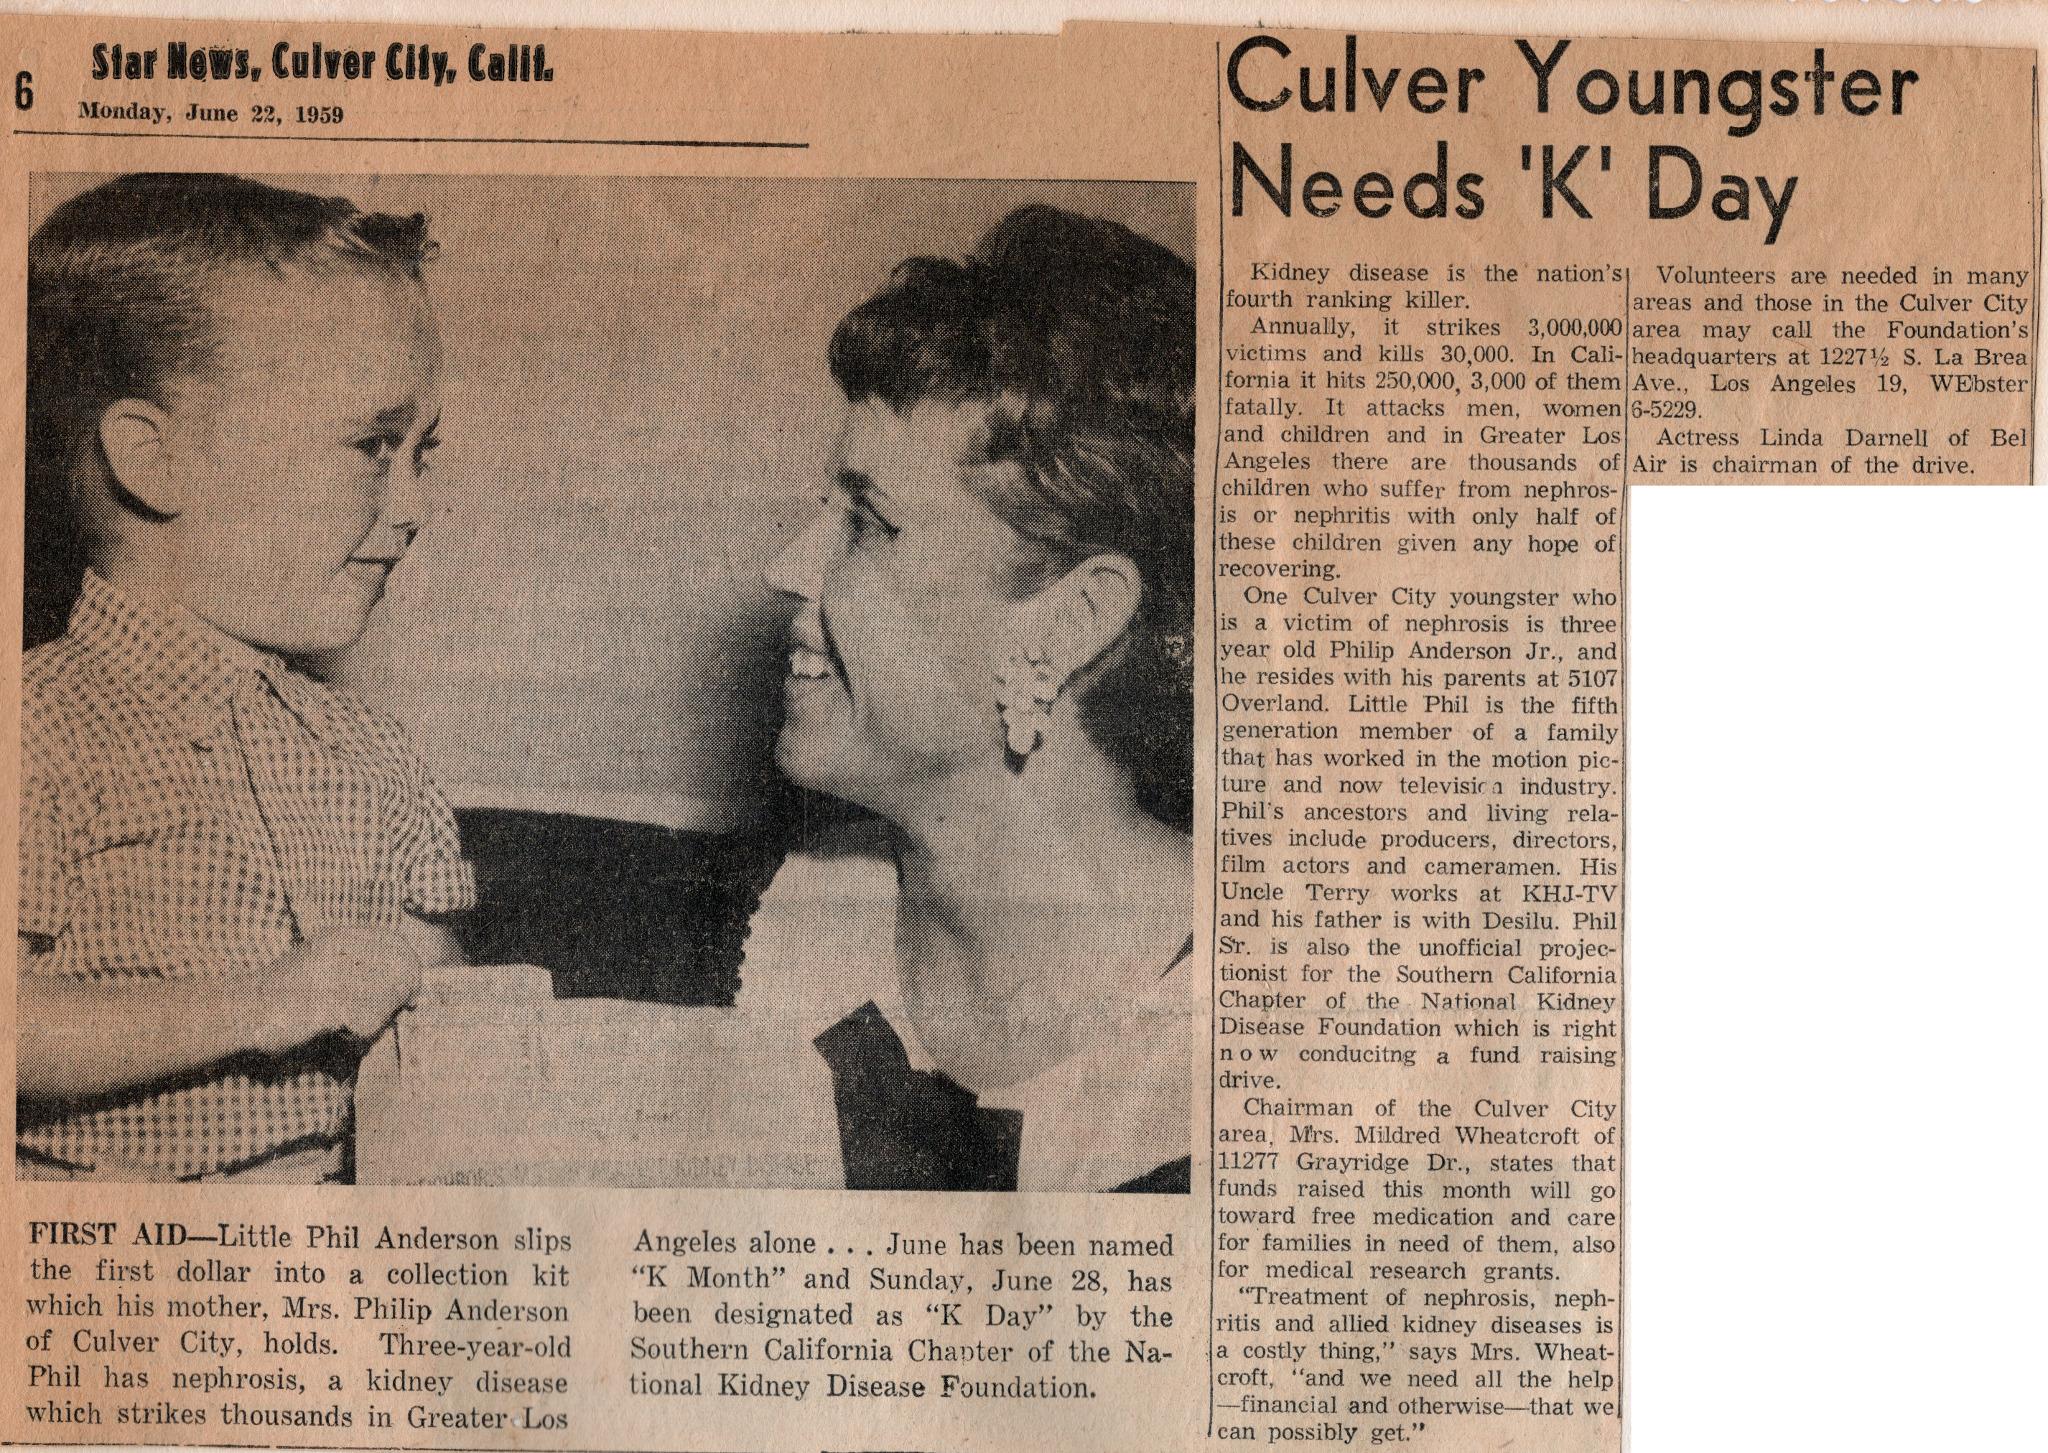 Buddy Kidney Disease Foundation - 1959